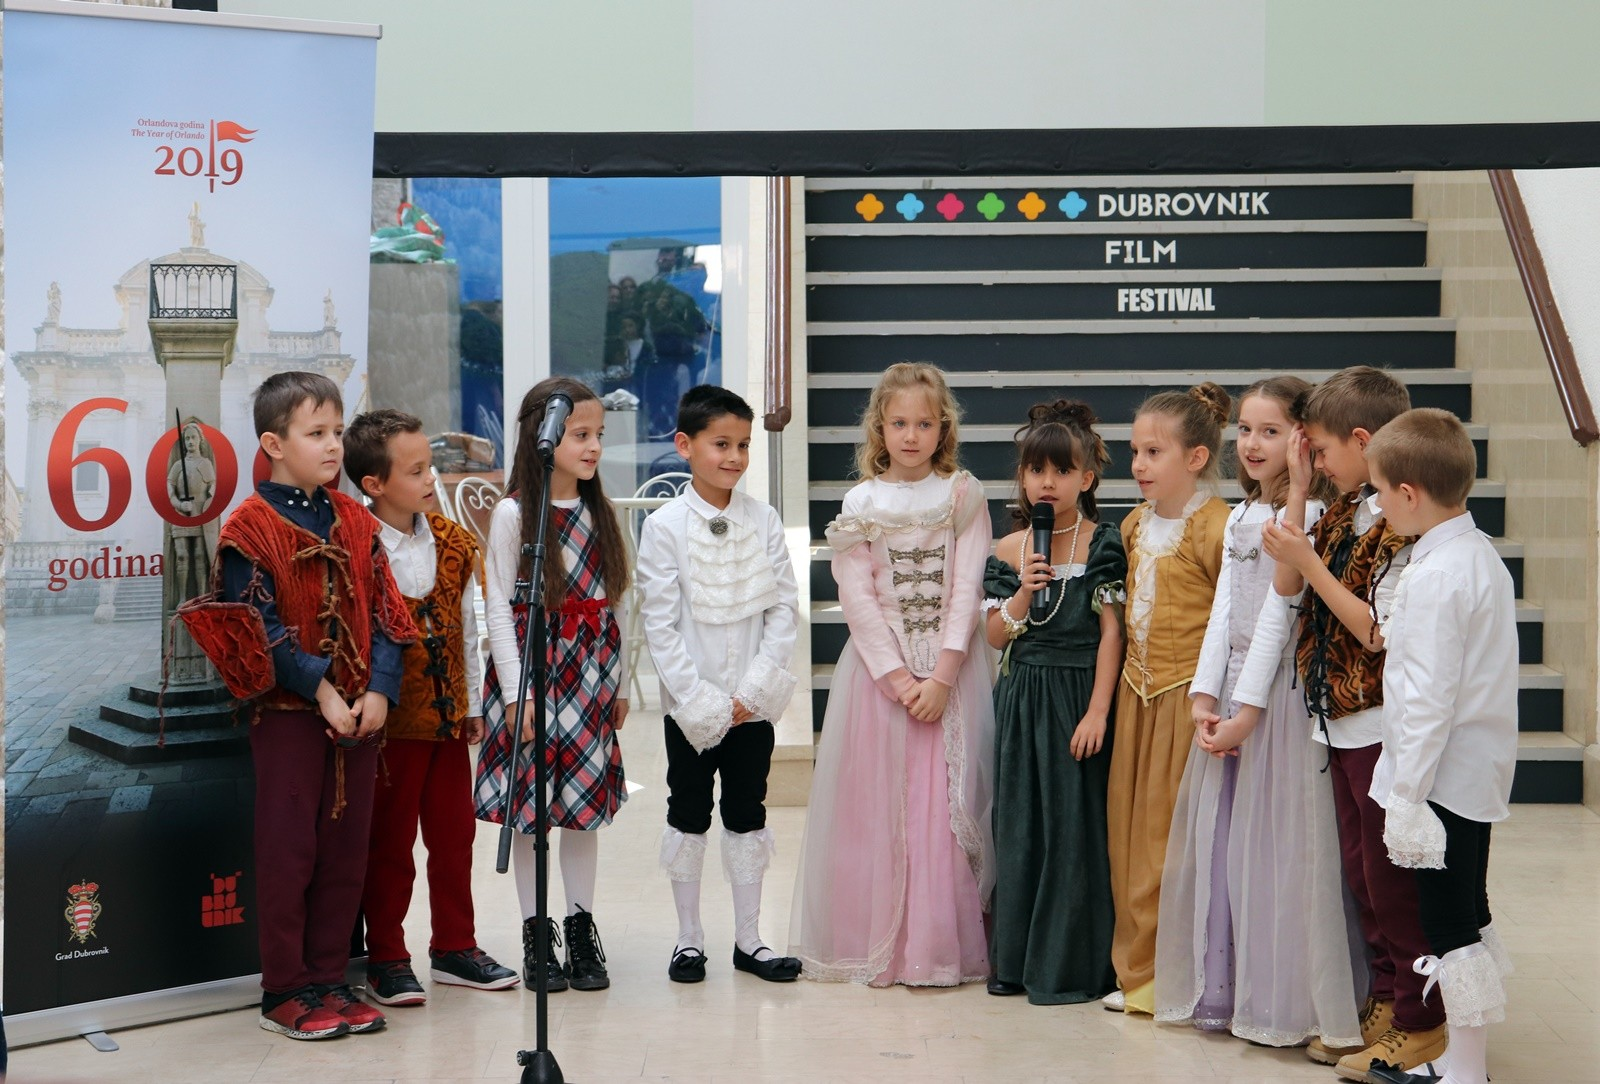 Vitez Orlando - glavni lik dječjih autorskih slikovnica i pjesmice